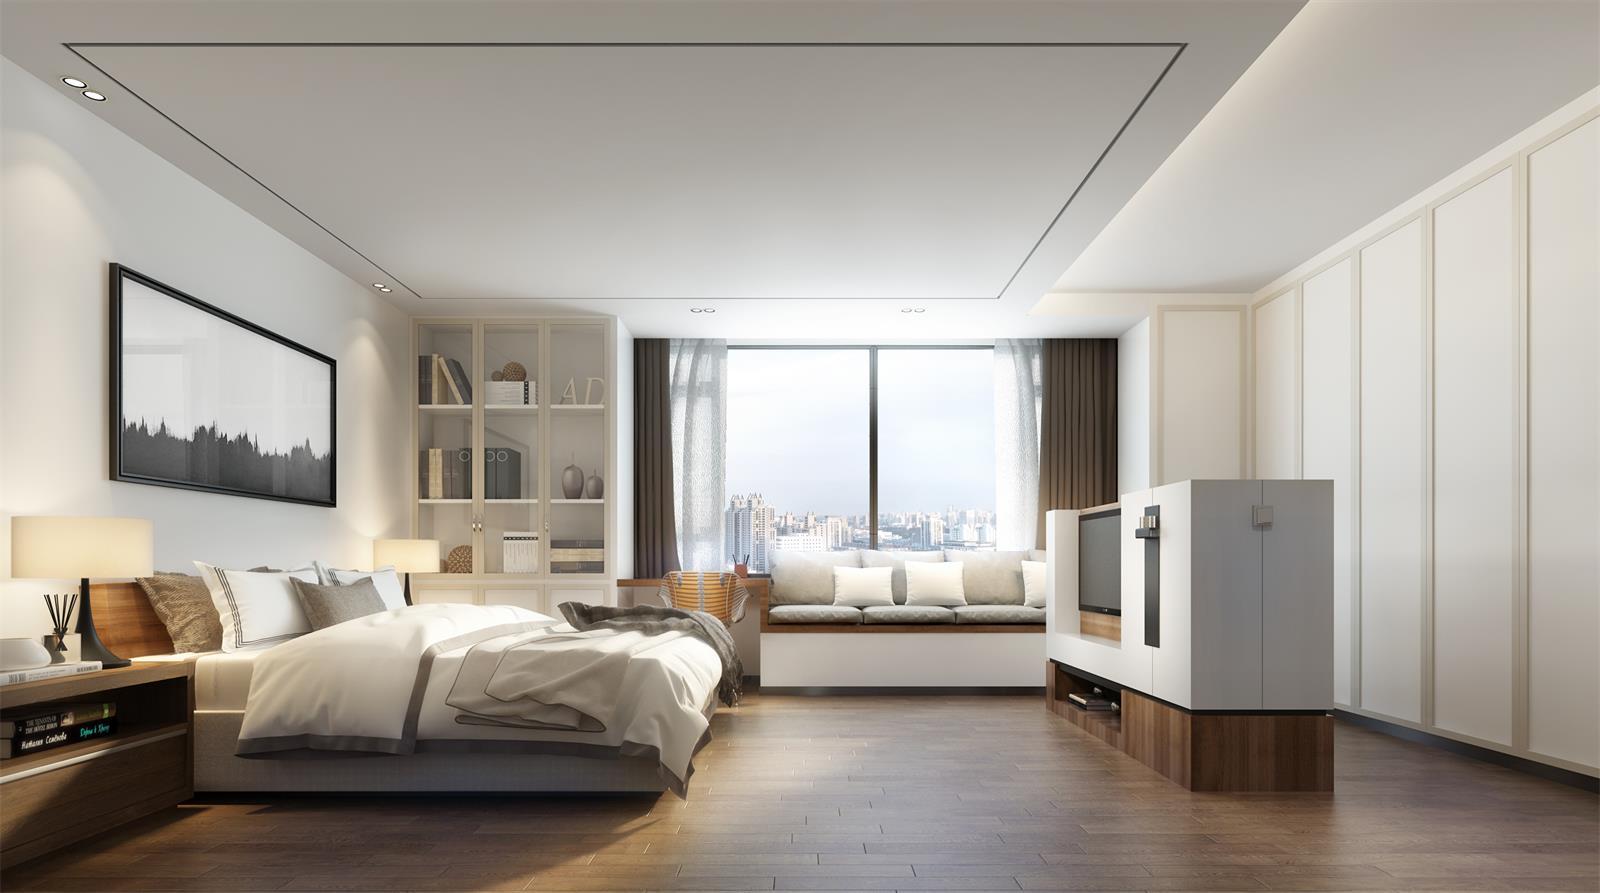 Furniture, Fixtures & Equipment (FF&E) in Interior Rendering